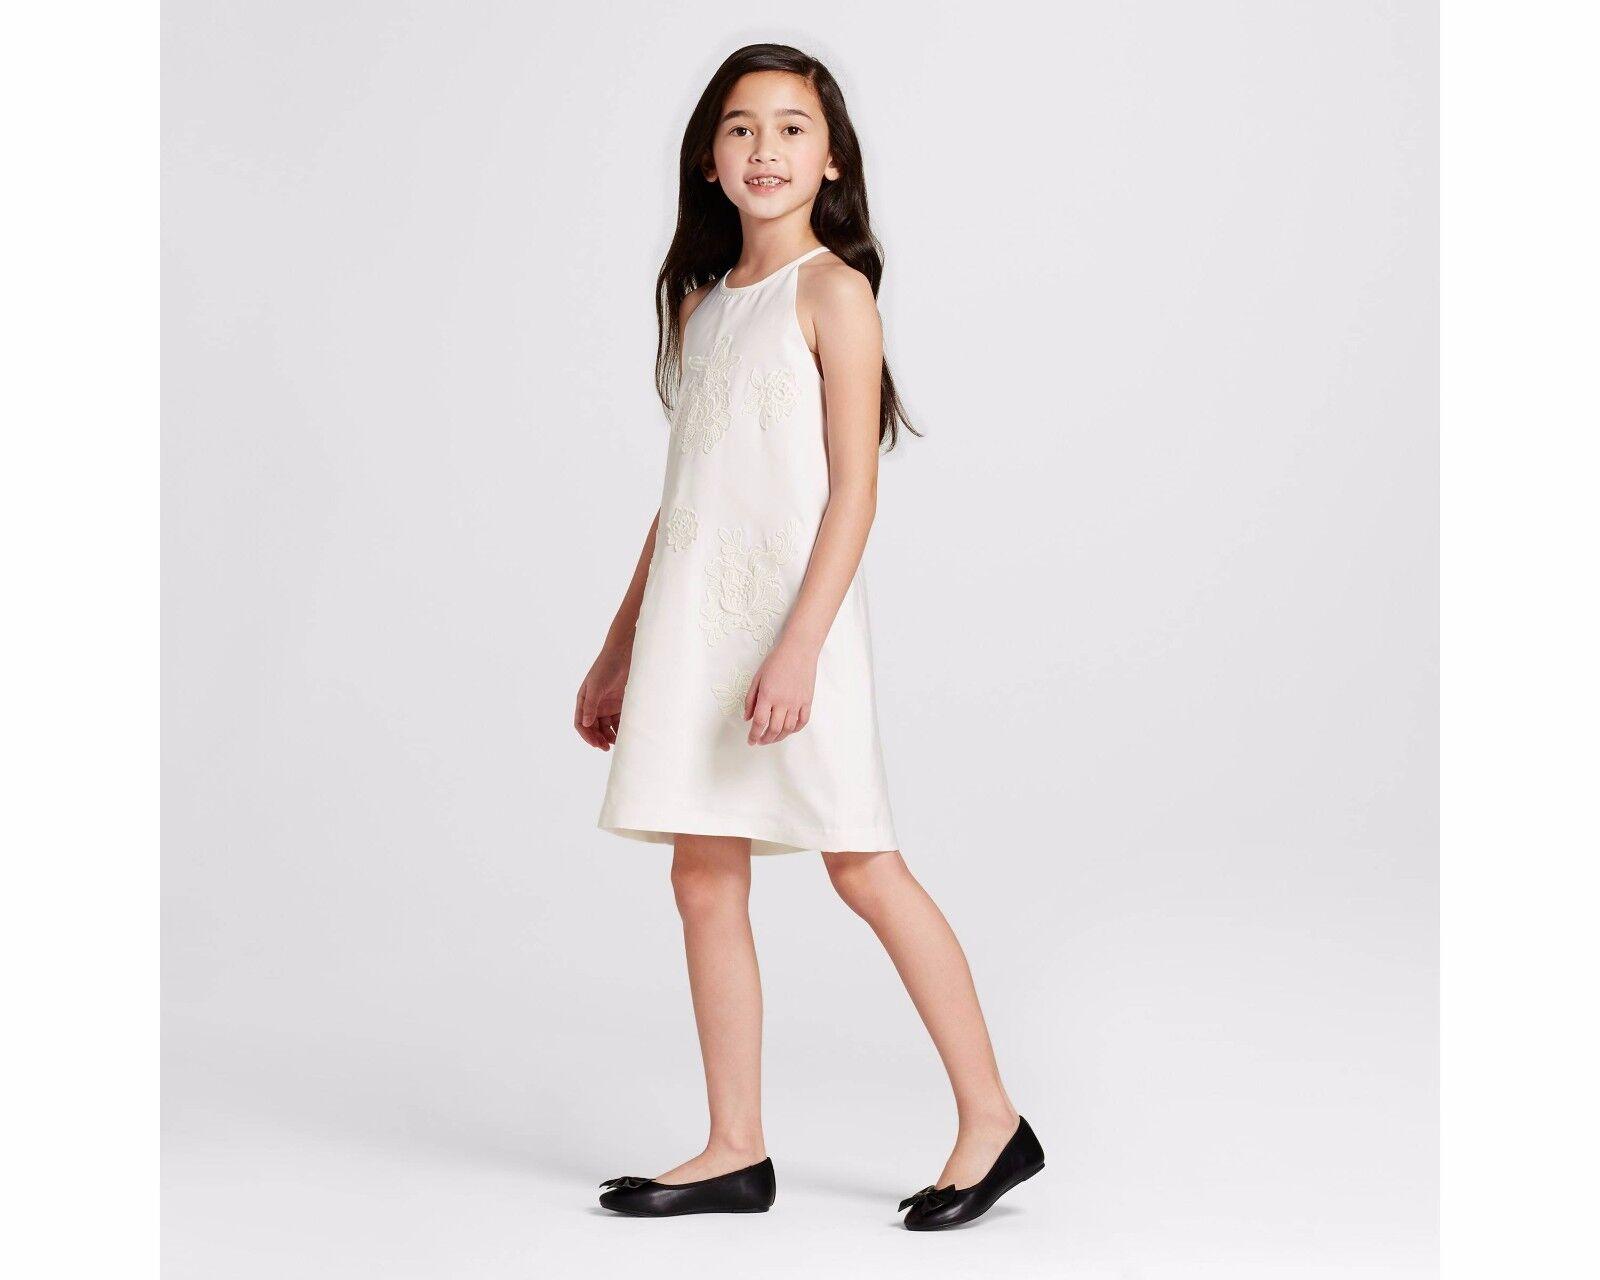 Victoria beckham for target white high neck floral appliqué dress